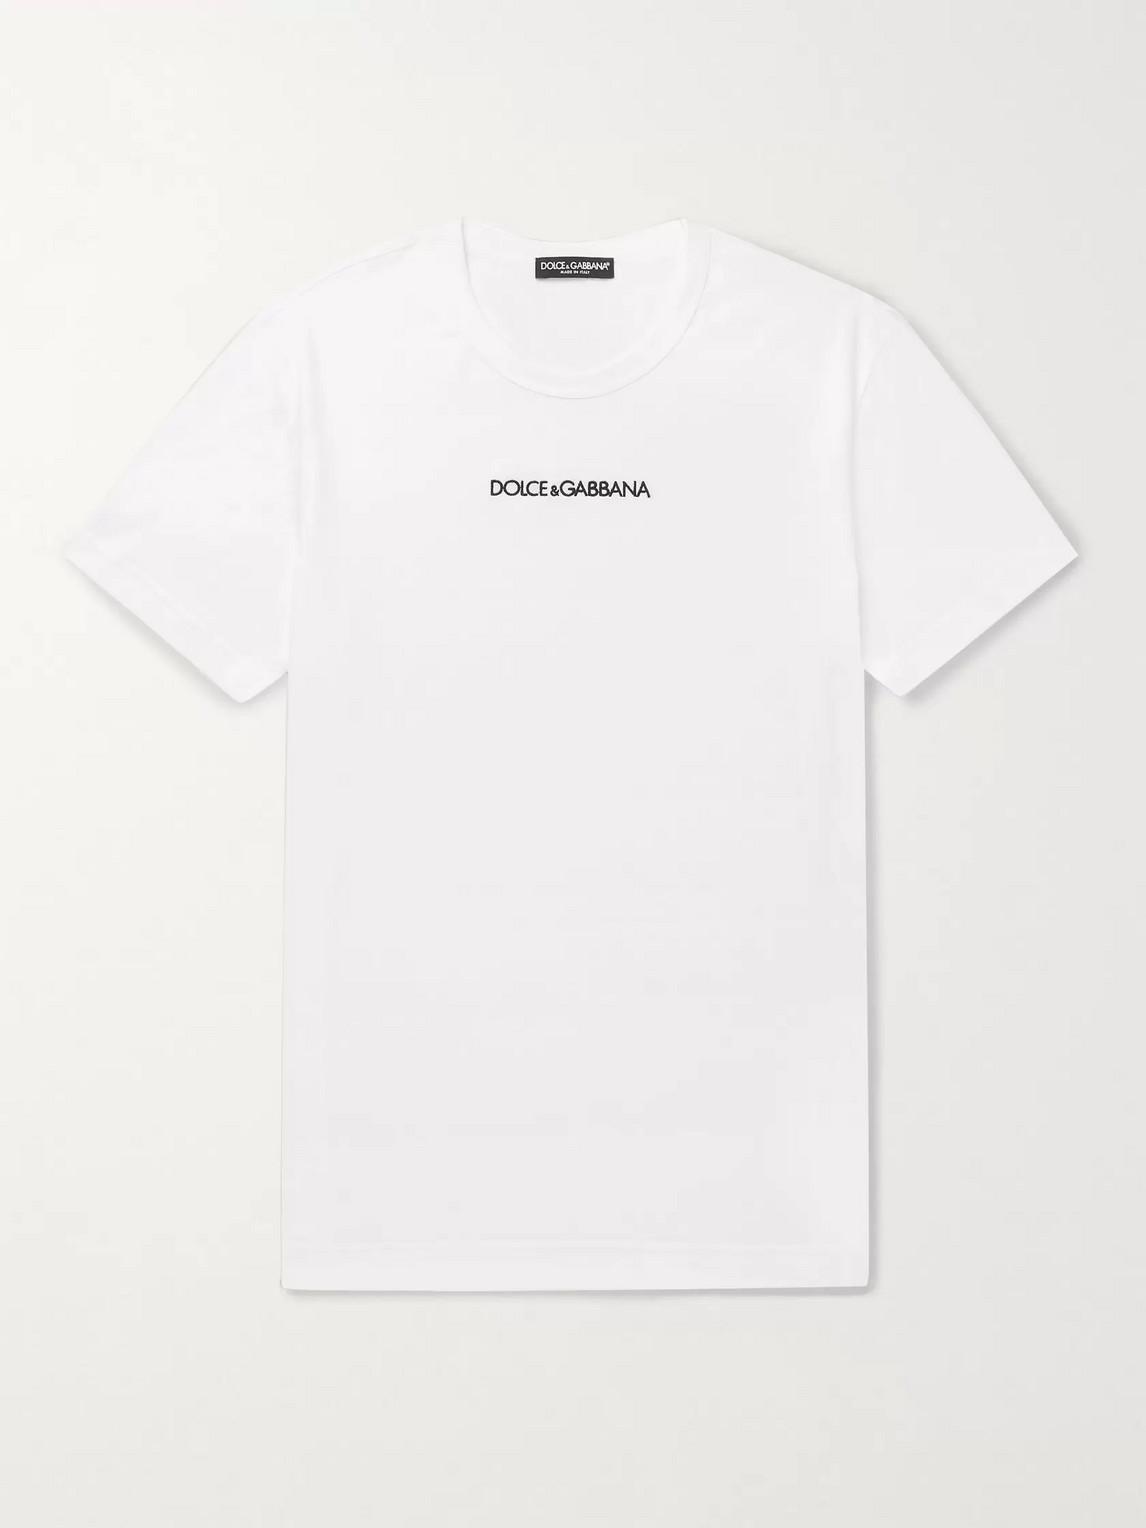 dolce amp; gabbana - slim-fit logo-embroidered cotton-jersey t-shirt - men - white